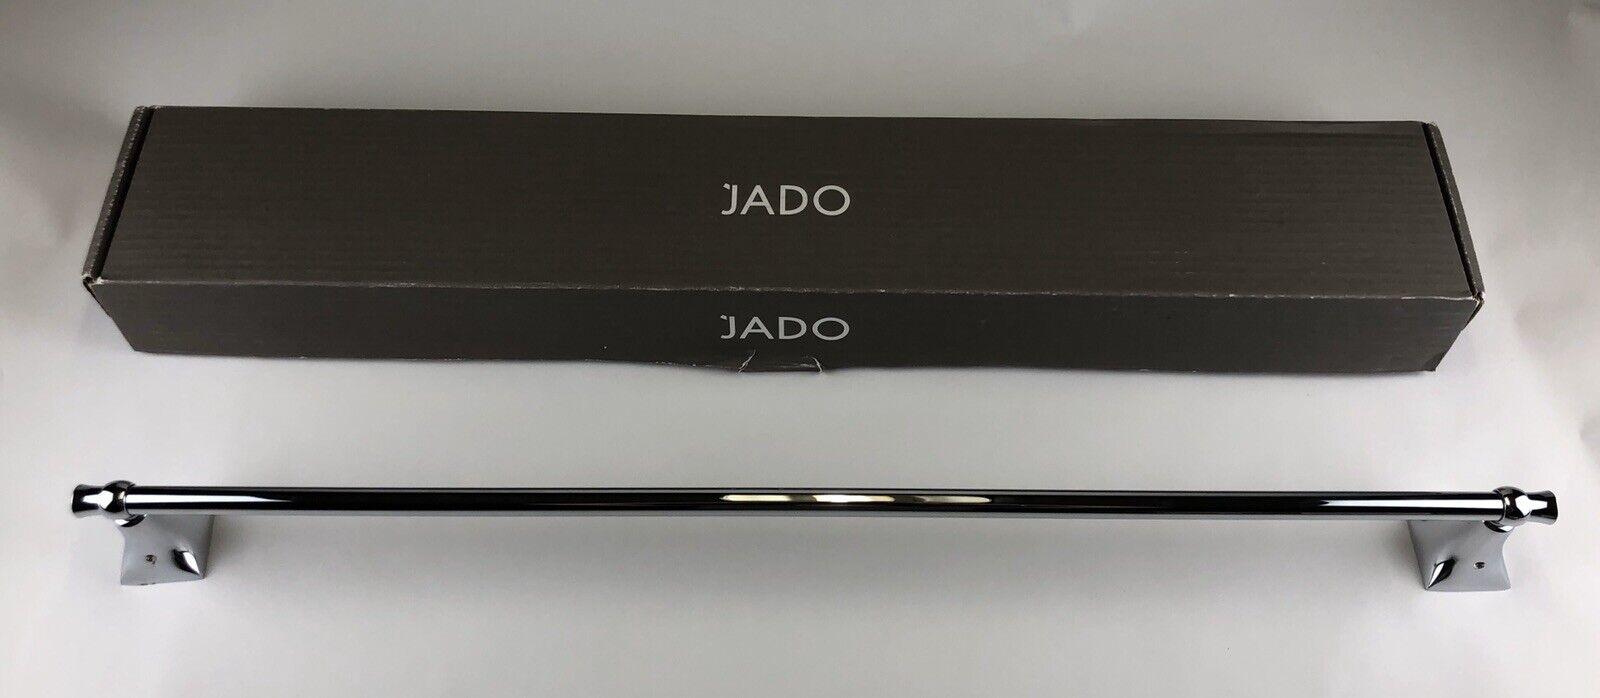 "~NIB~ JADO Bathroom 30"" Towel Bar - Illume Series - Polished Chrome 020/800/"